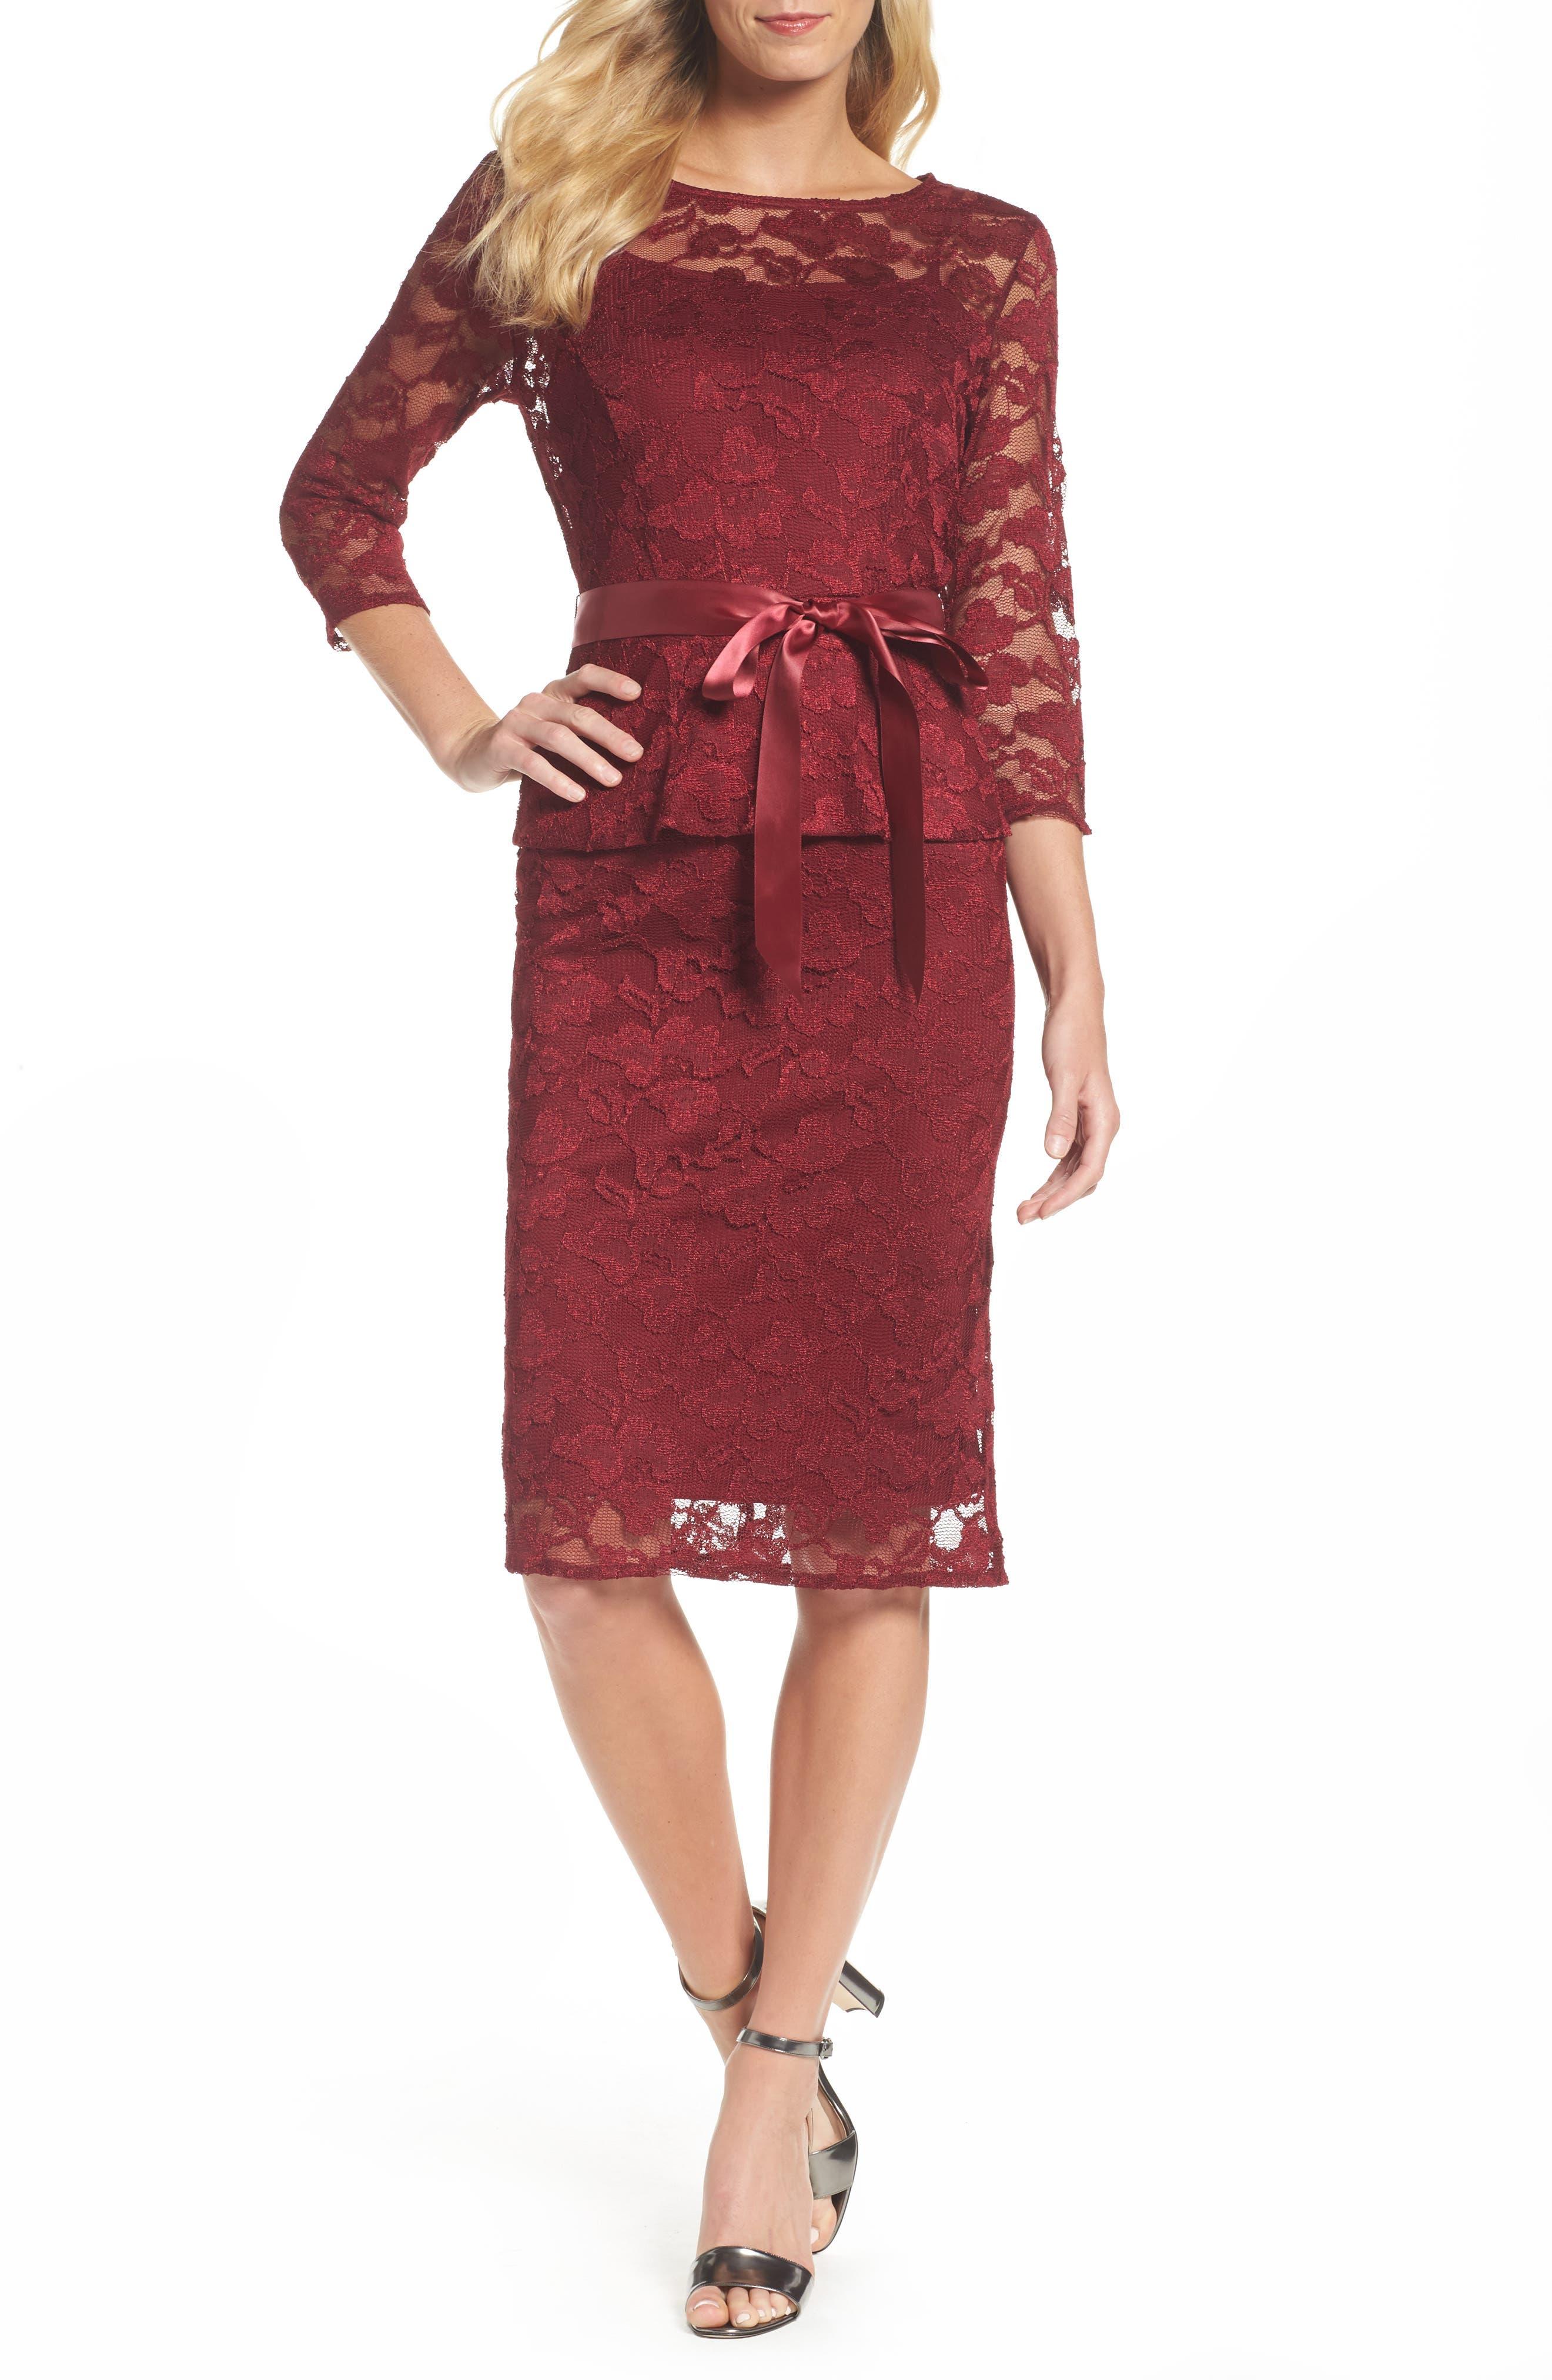 Cheetah b long dresses quilt